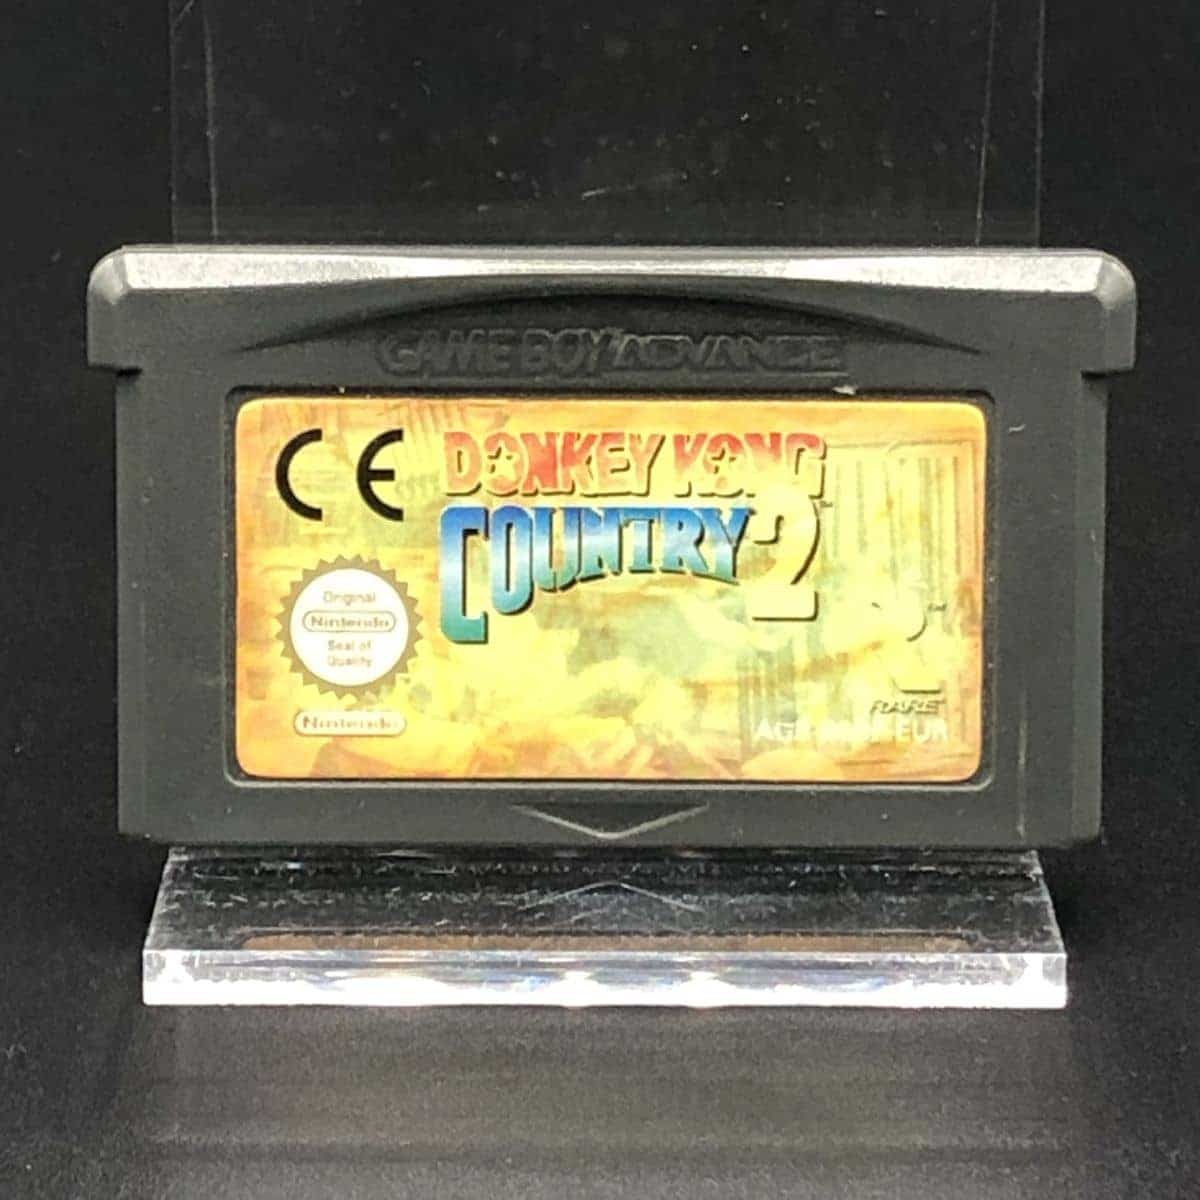 GBA Donkey Kong Country 2: Diddy Kong's Quest (Modul) (Gebrauchsspuren) Game Boy Advance